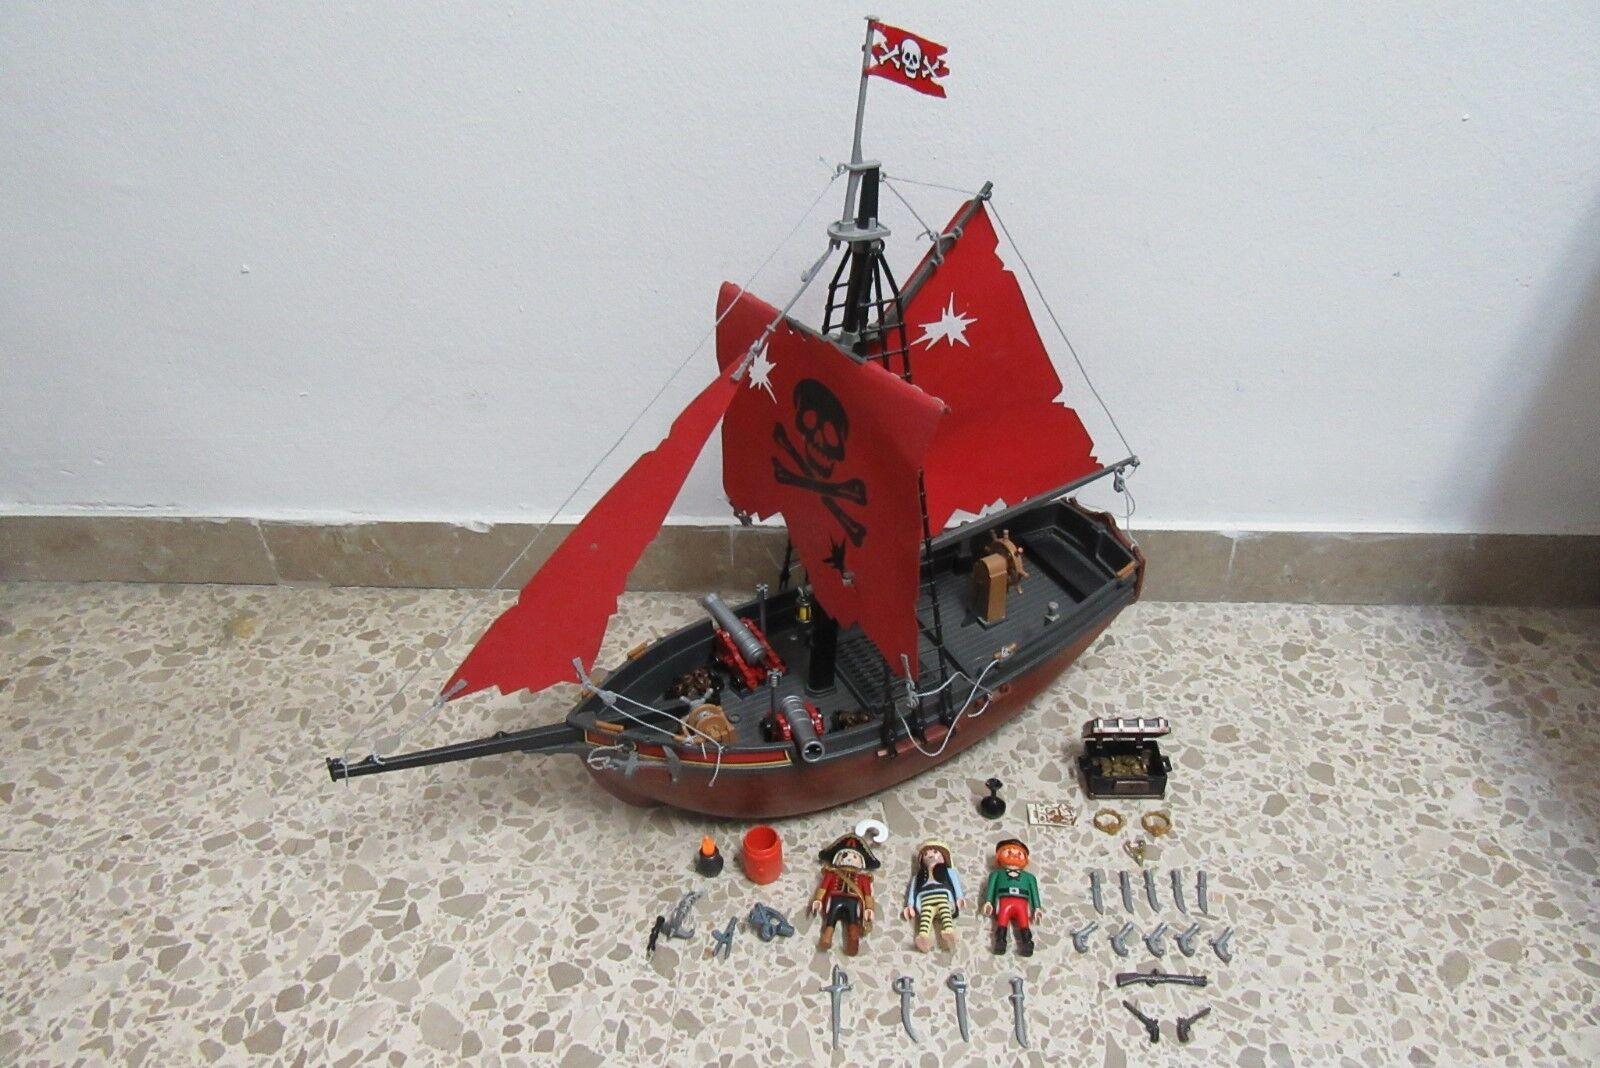 Playmobil - Piratas - - - Barco Goleta Rojo Cañon Cofre - 3174 - (COMPLETO) 9c57f5